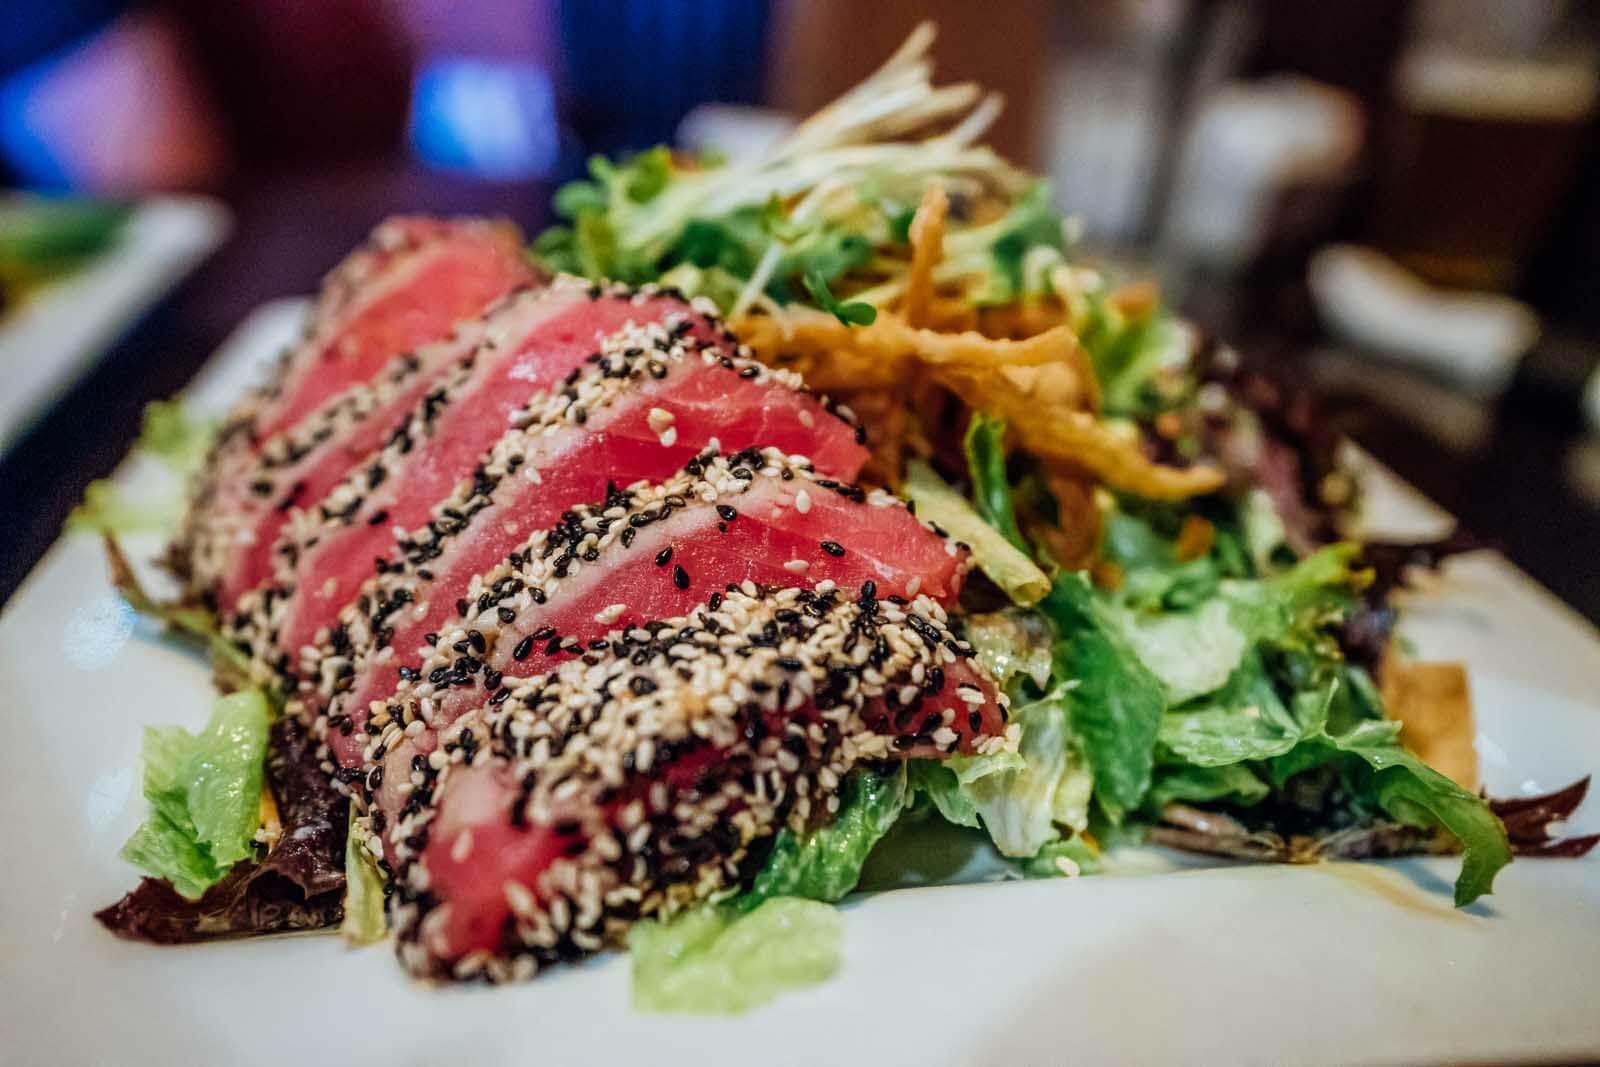 Ahi Tuna salad at Second Street Grill in downtown Yakima